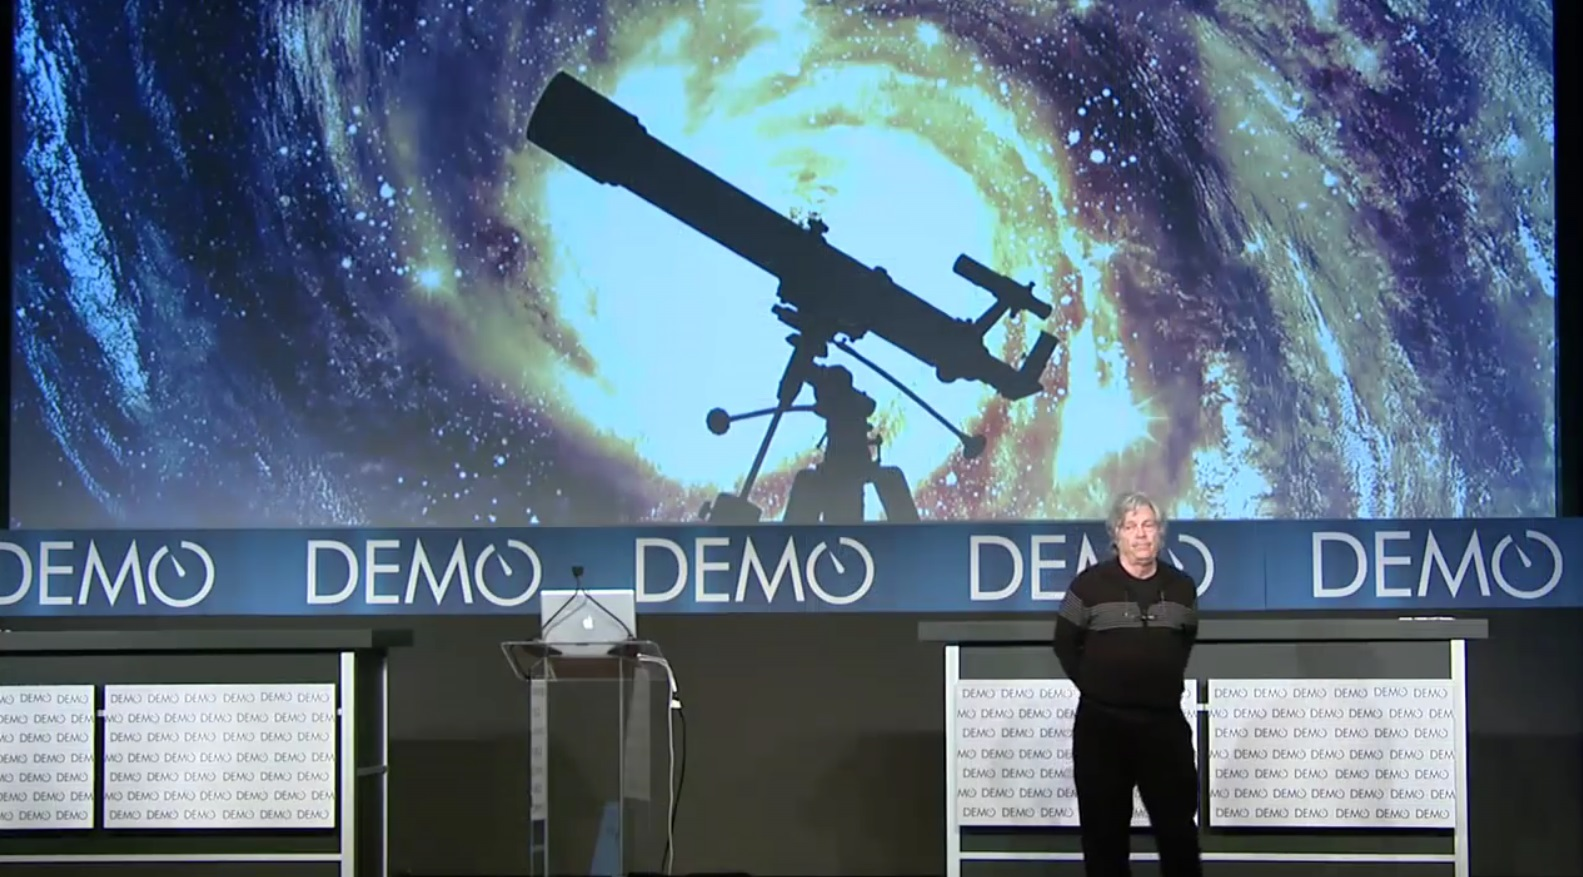 Alan Kay: The future can not be built gradually